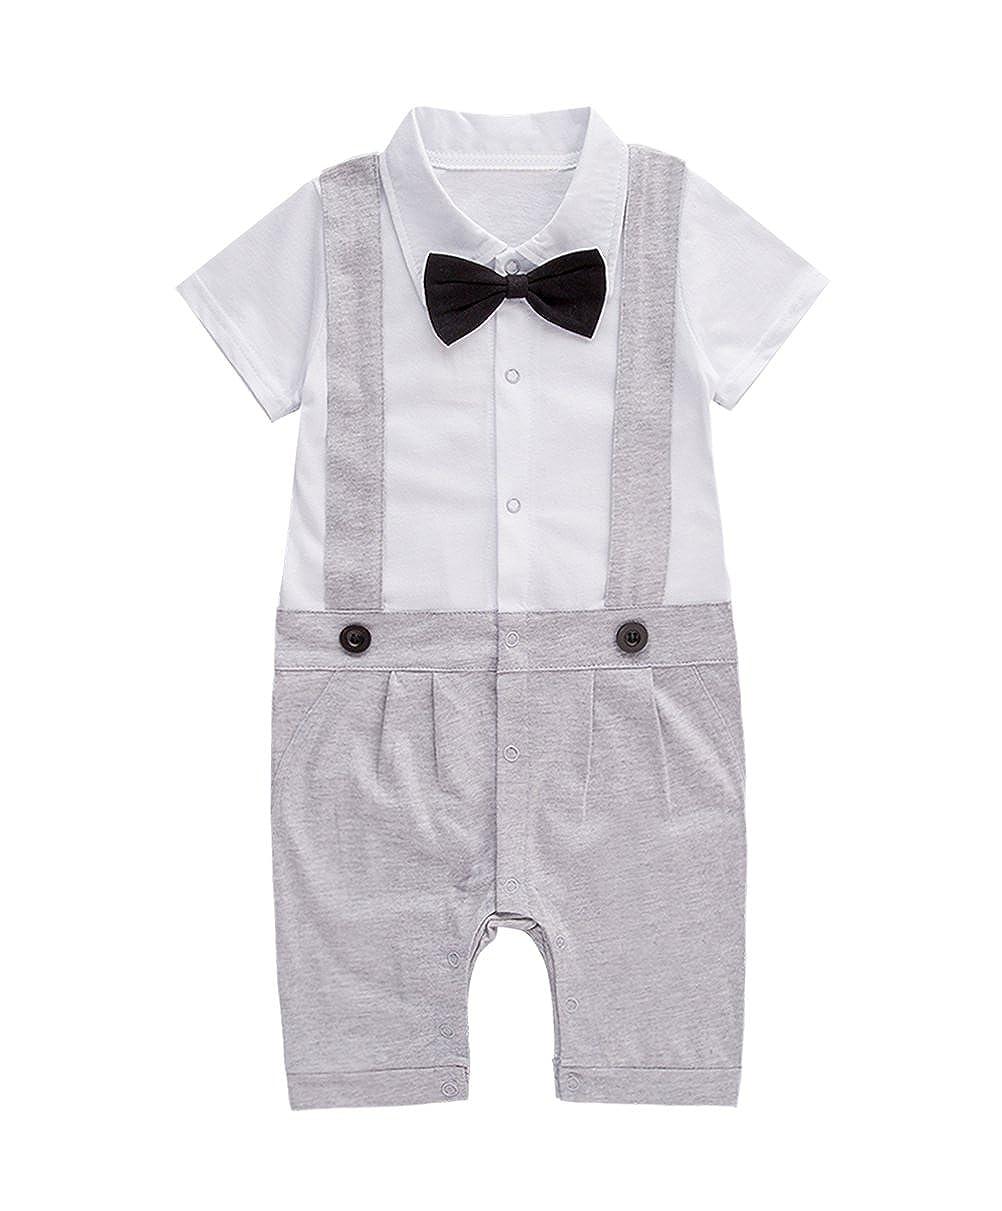 XM Nyan Mays Baby Boys Short Sleeve Bowtie Faux Suspenders Tuxedo Romper